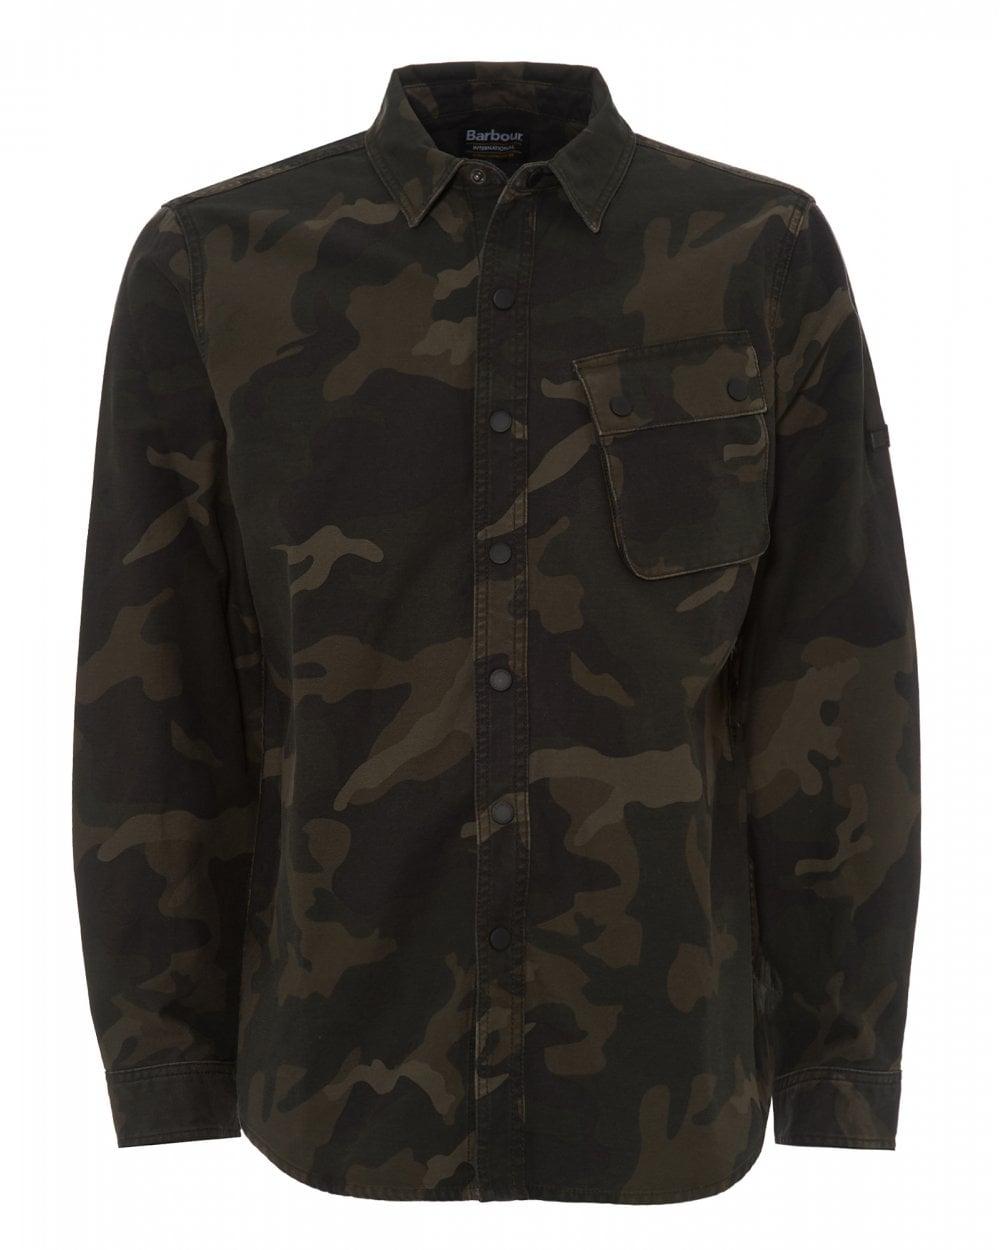 0708e4c703223 Barbour International Mens Cammo Overshirt, Dark Olive Jacket